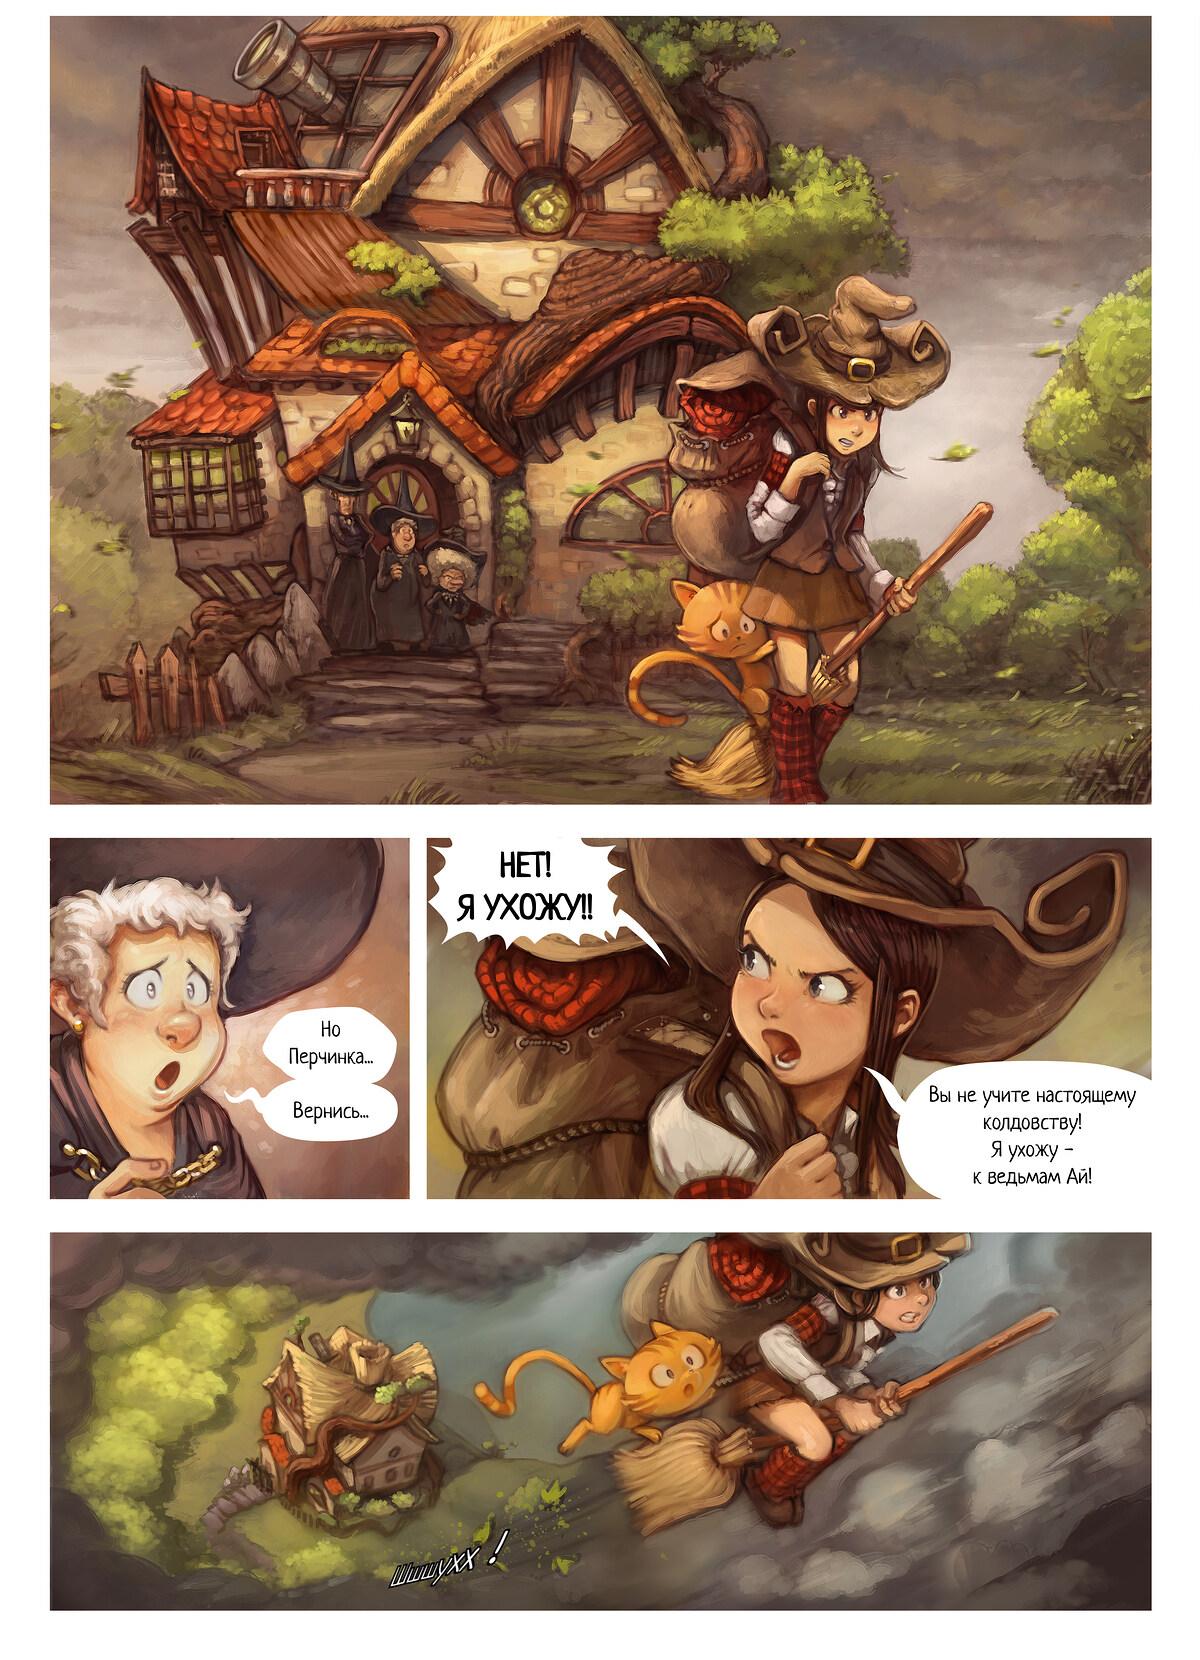 A webcomic page of Pepper&Carrot, эпизод 17 [ru], стр. 1